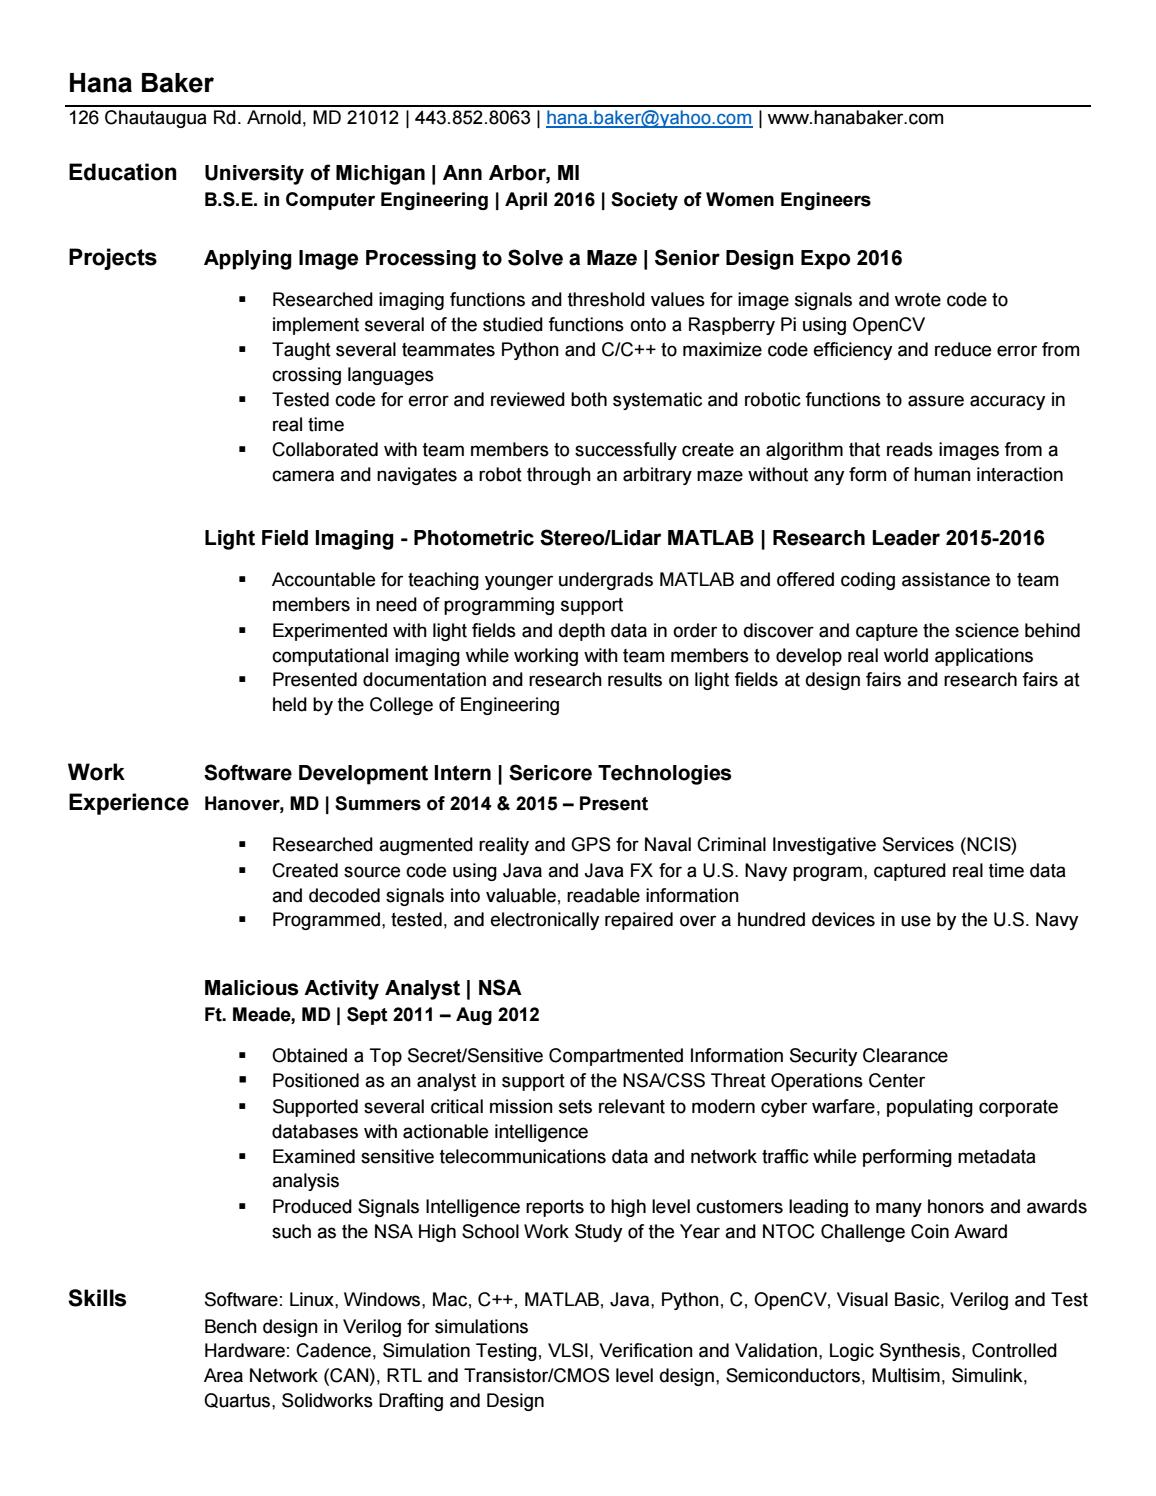 Resume by hanabaker - issuu